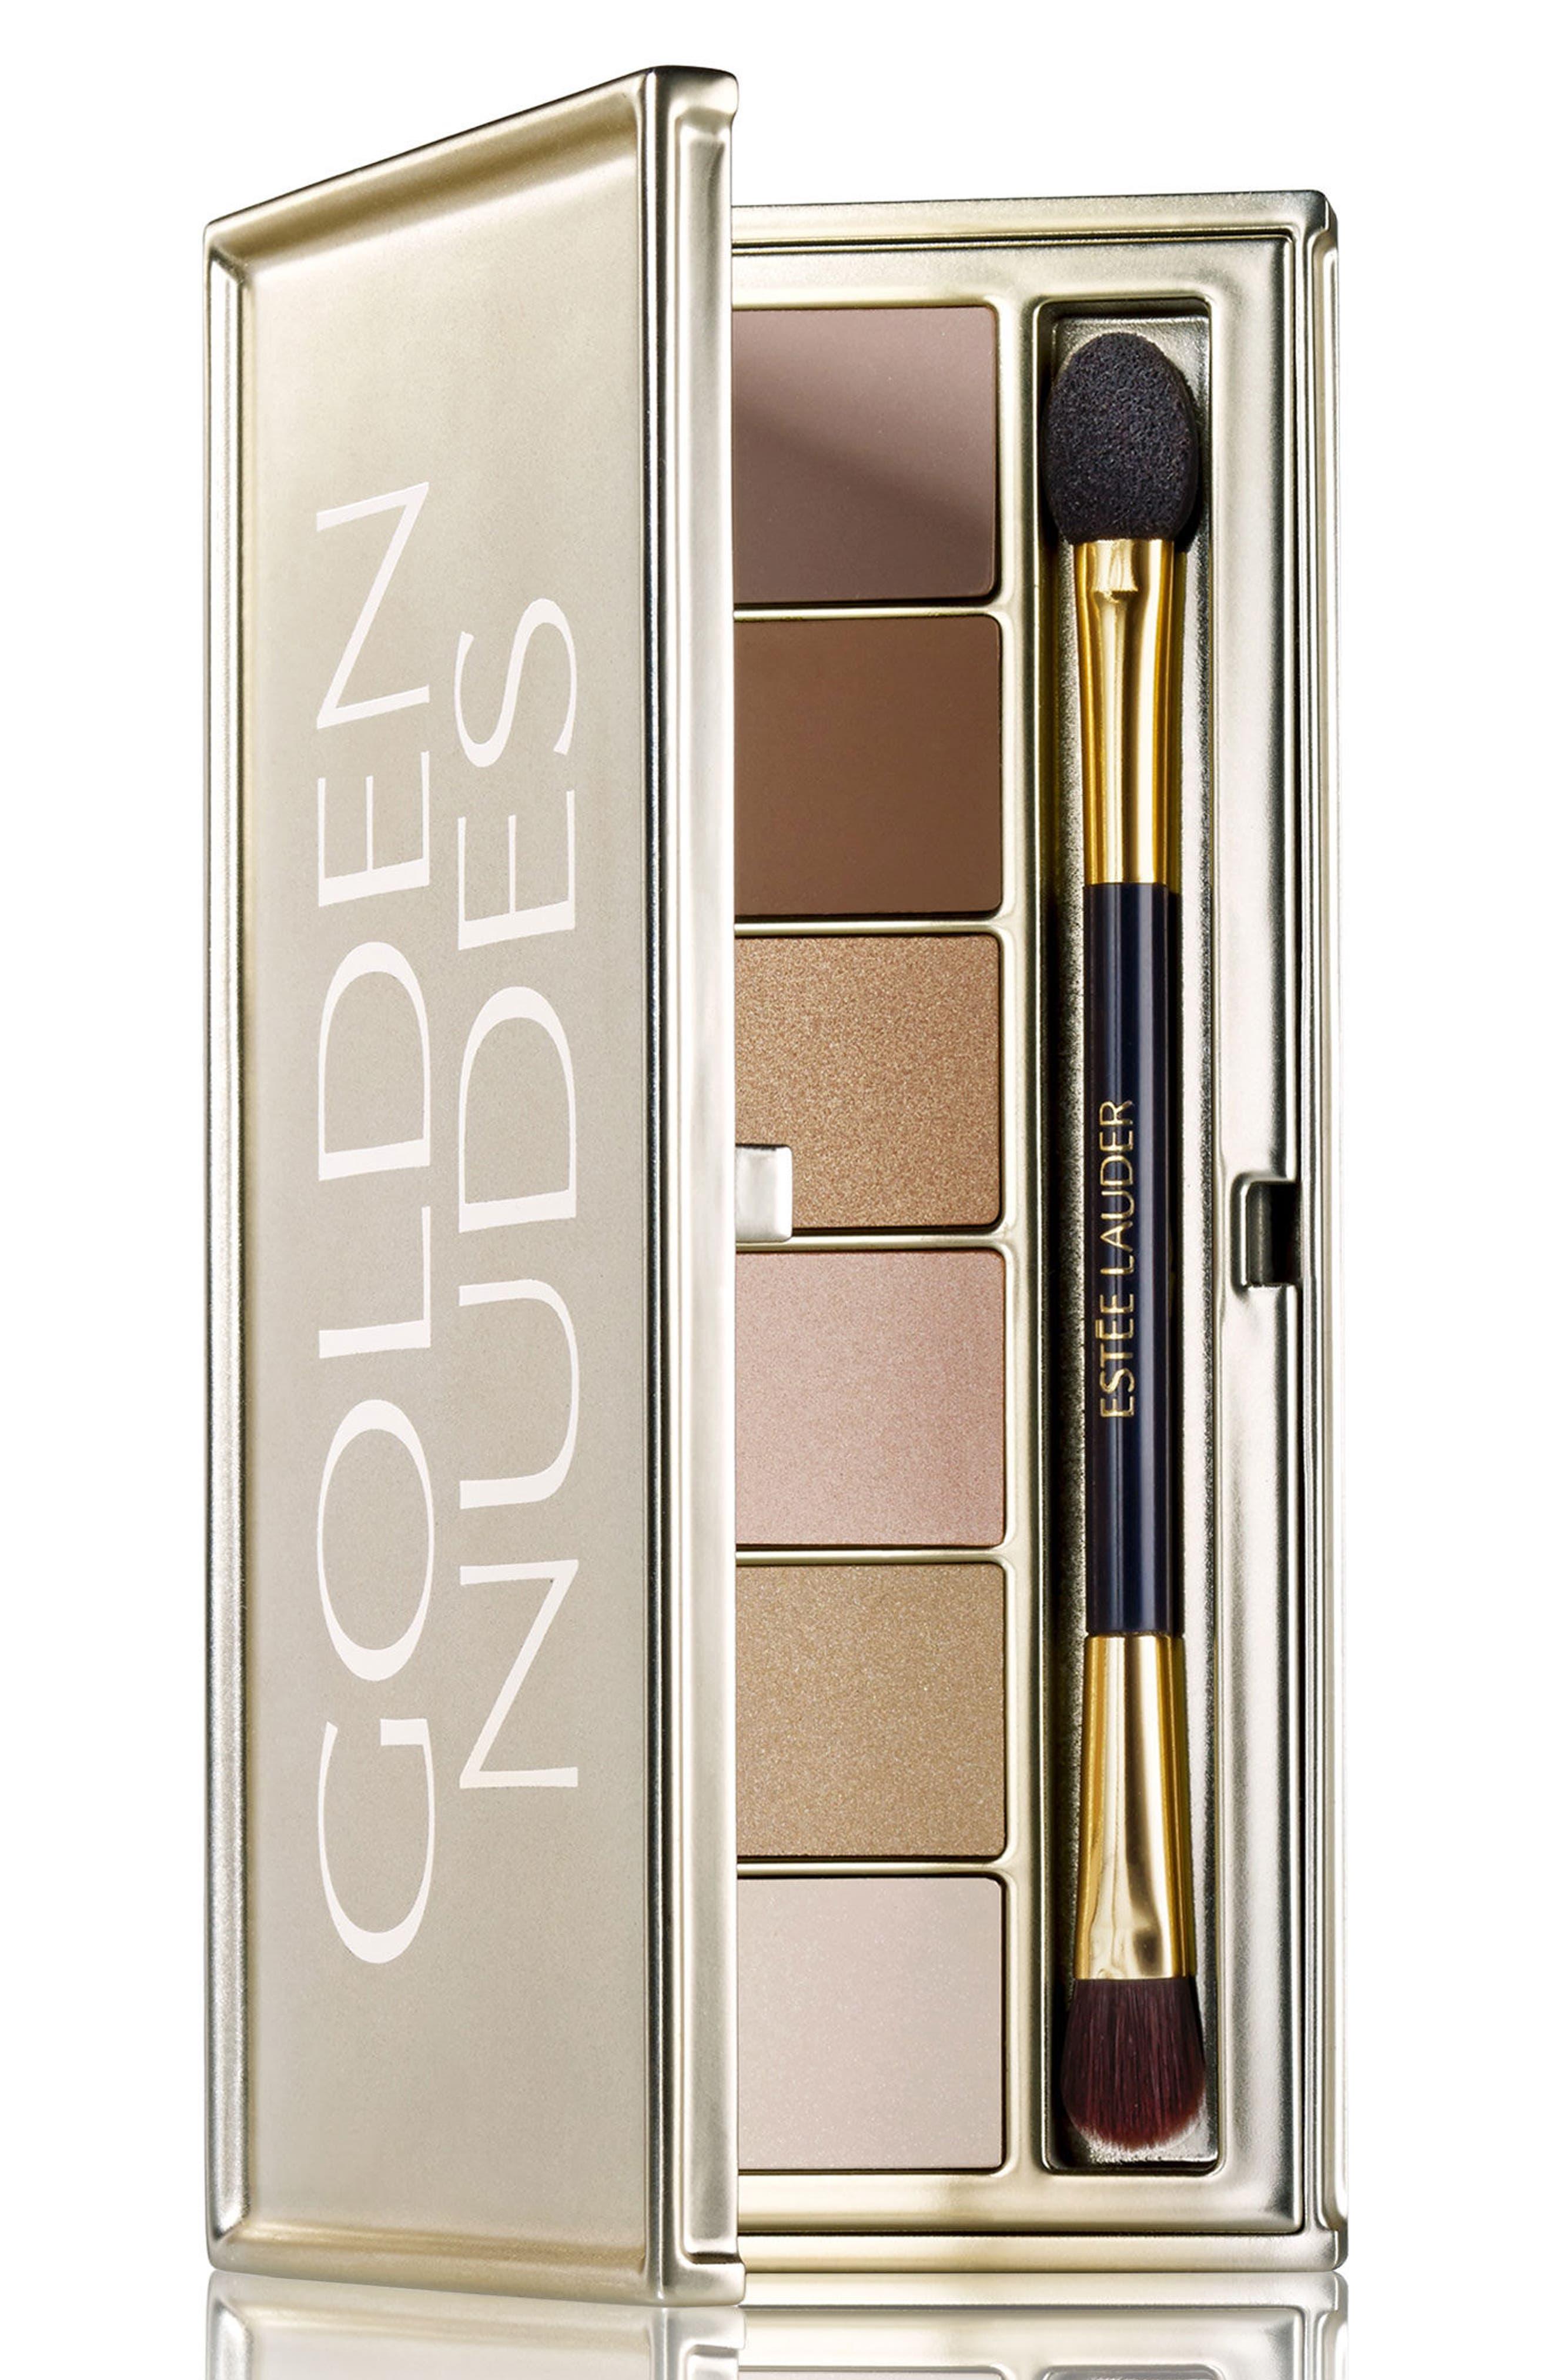 Golden Nudes Eyeshadow Palette,                         Main,                         color, No Color